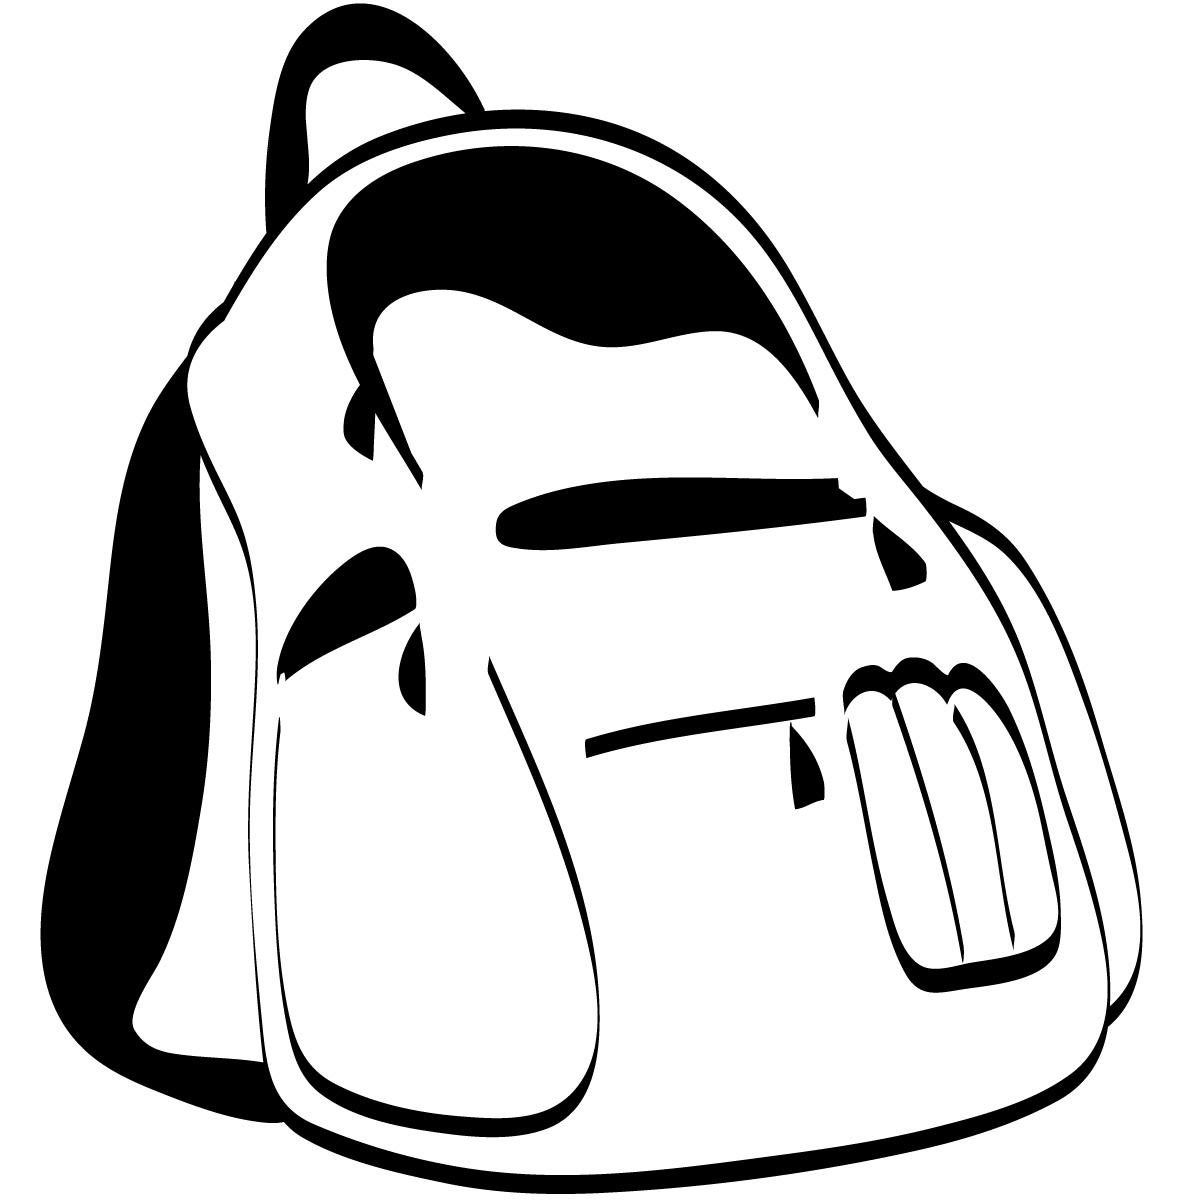 1200x1200 Sleeping Bag Clipart Black And White Clipart Panda